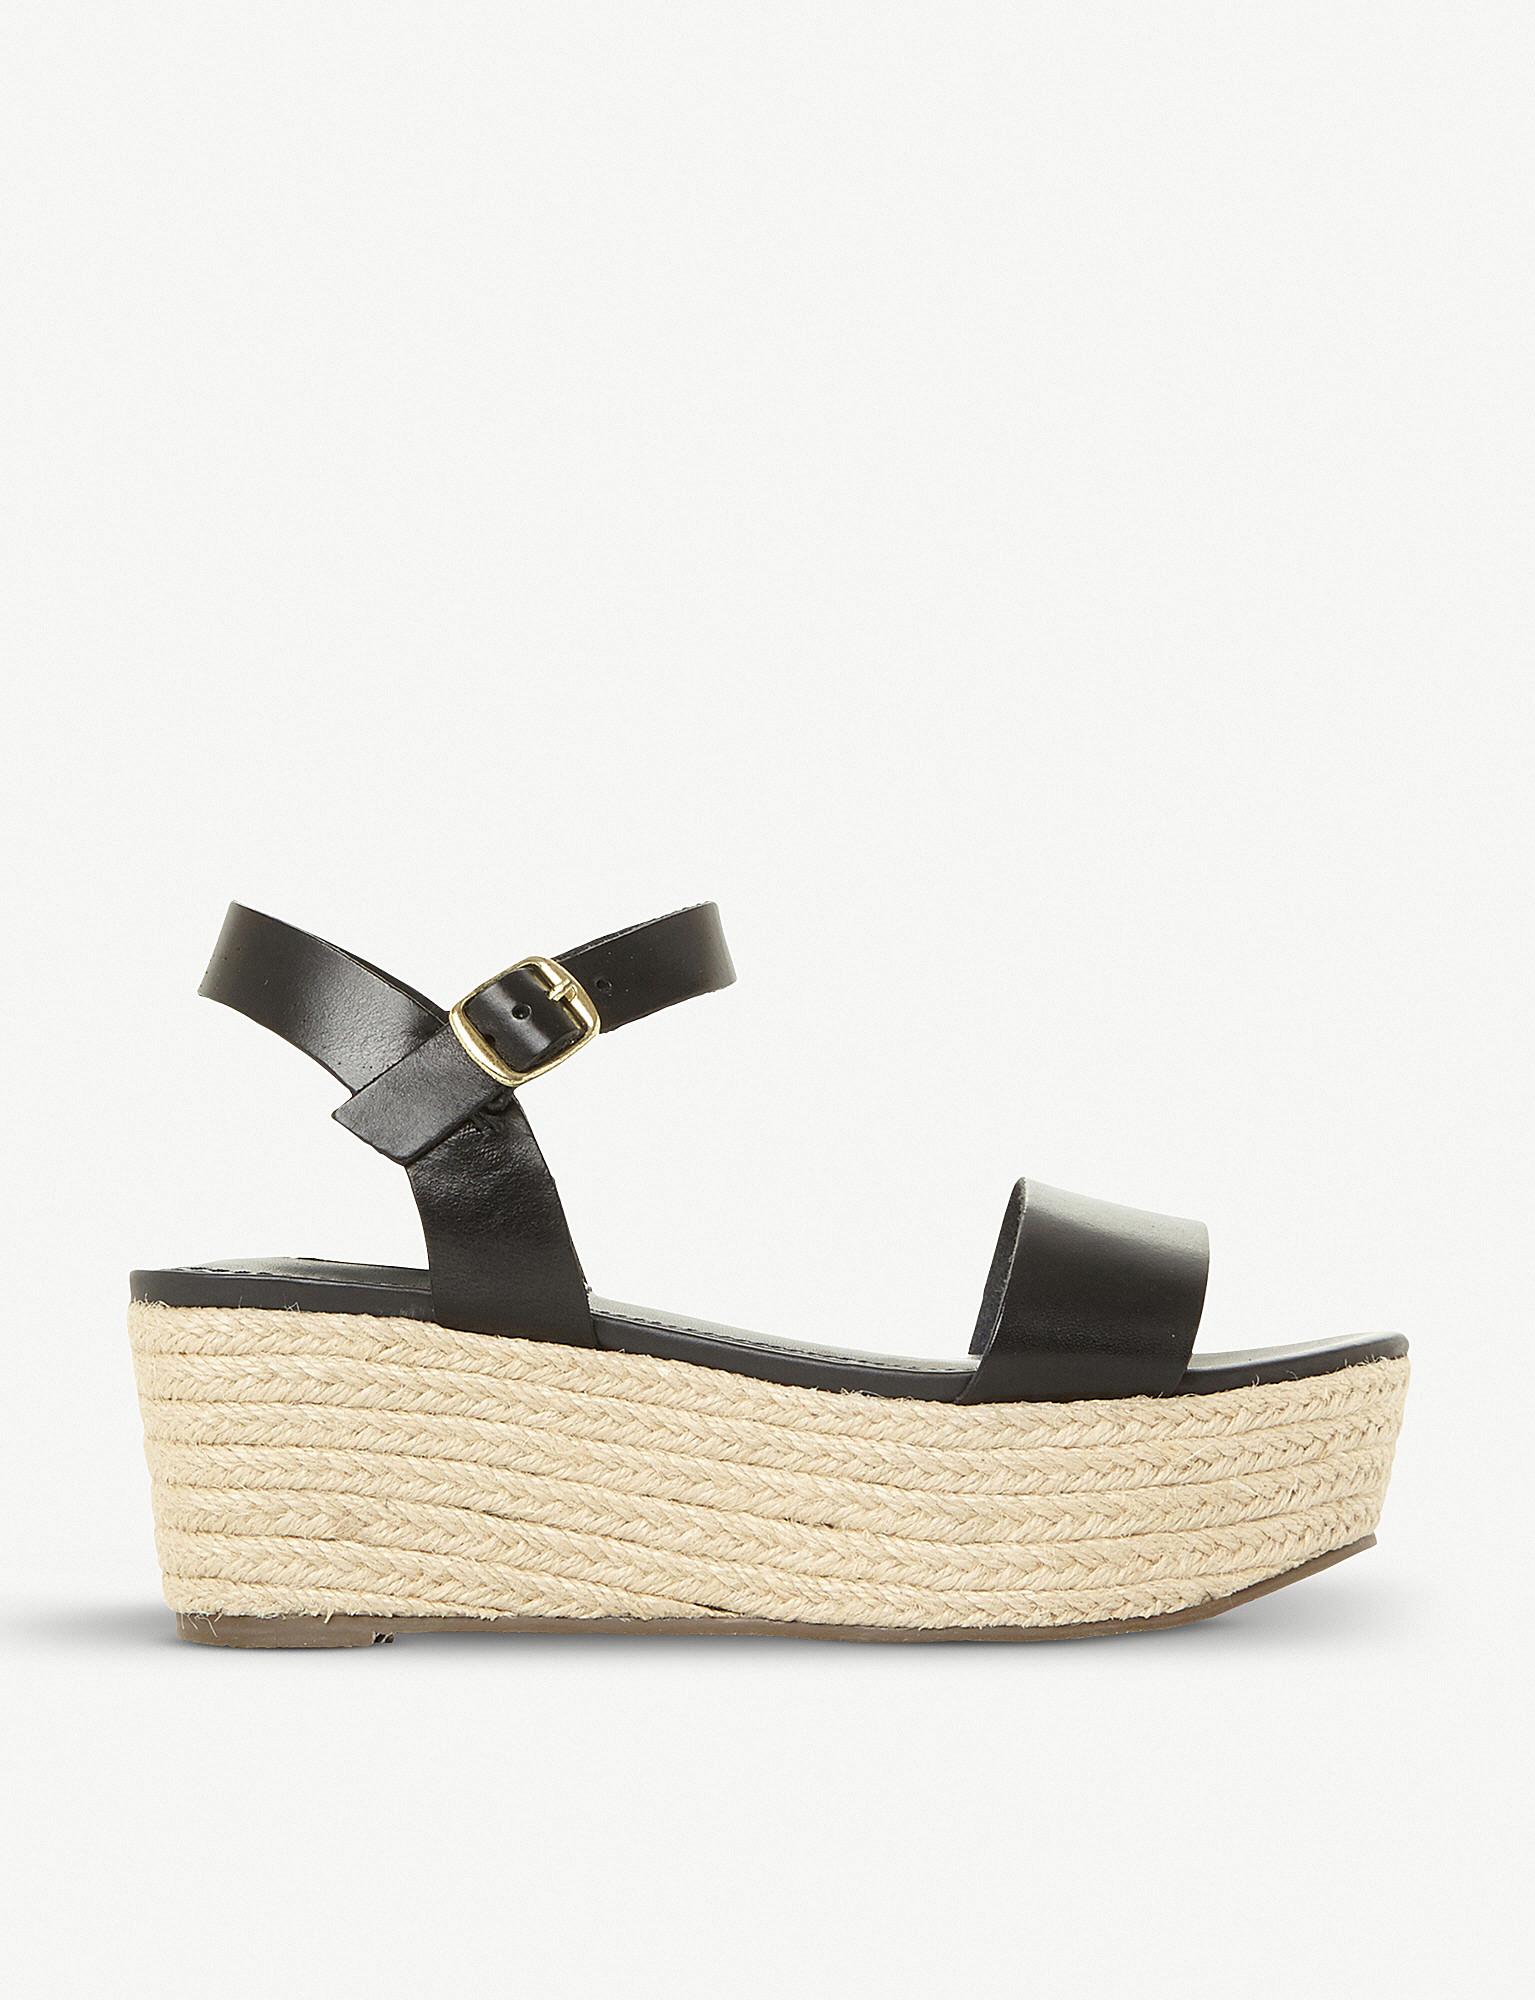 8ee57386645 STEVE MADDEN - Busy SM leather and jute platform sandals ...